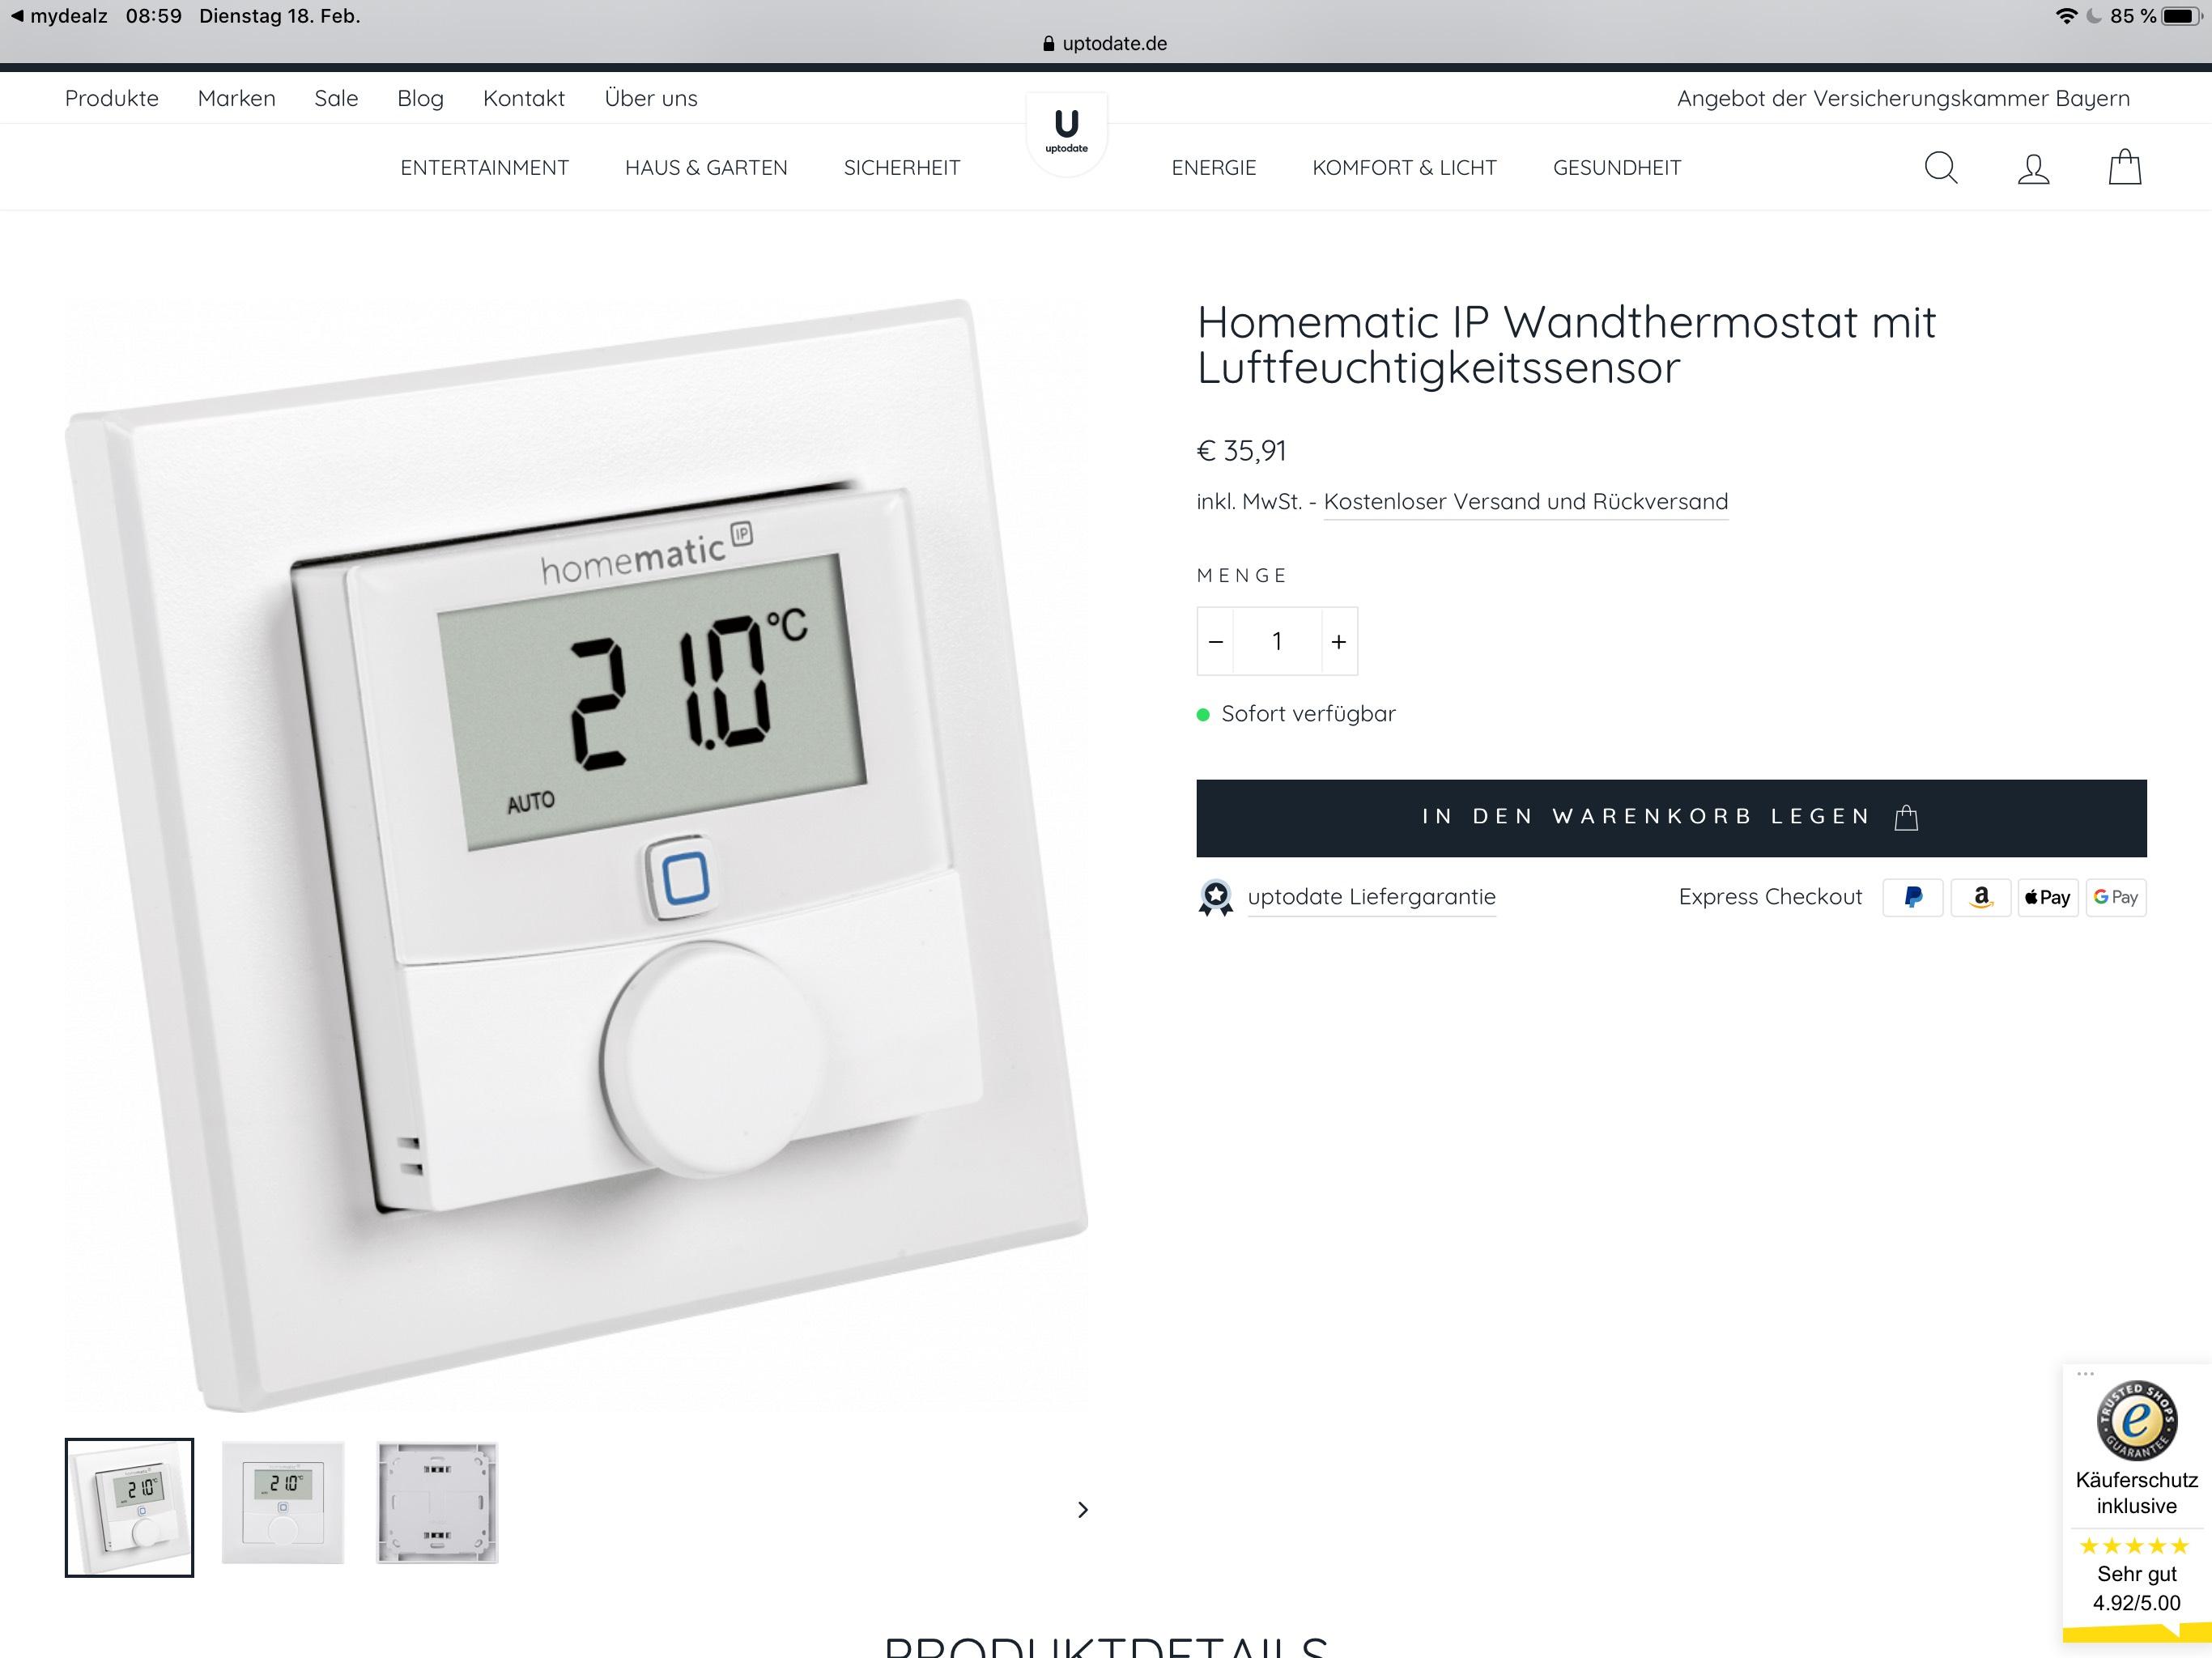 Homematic IP Wandthermostat WTH-2